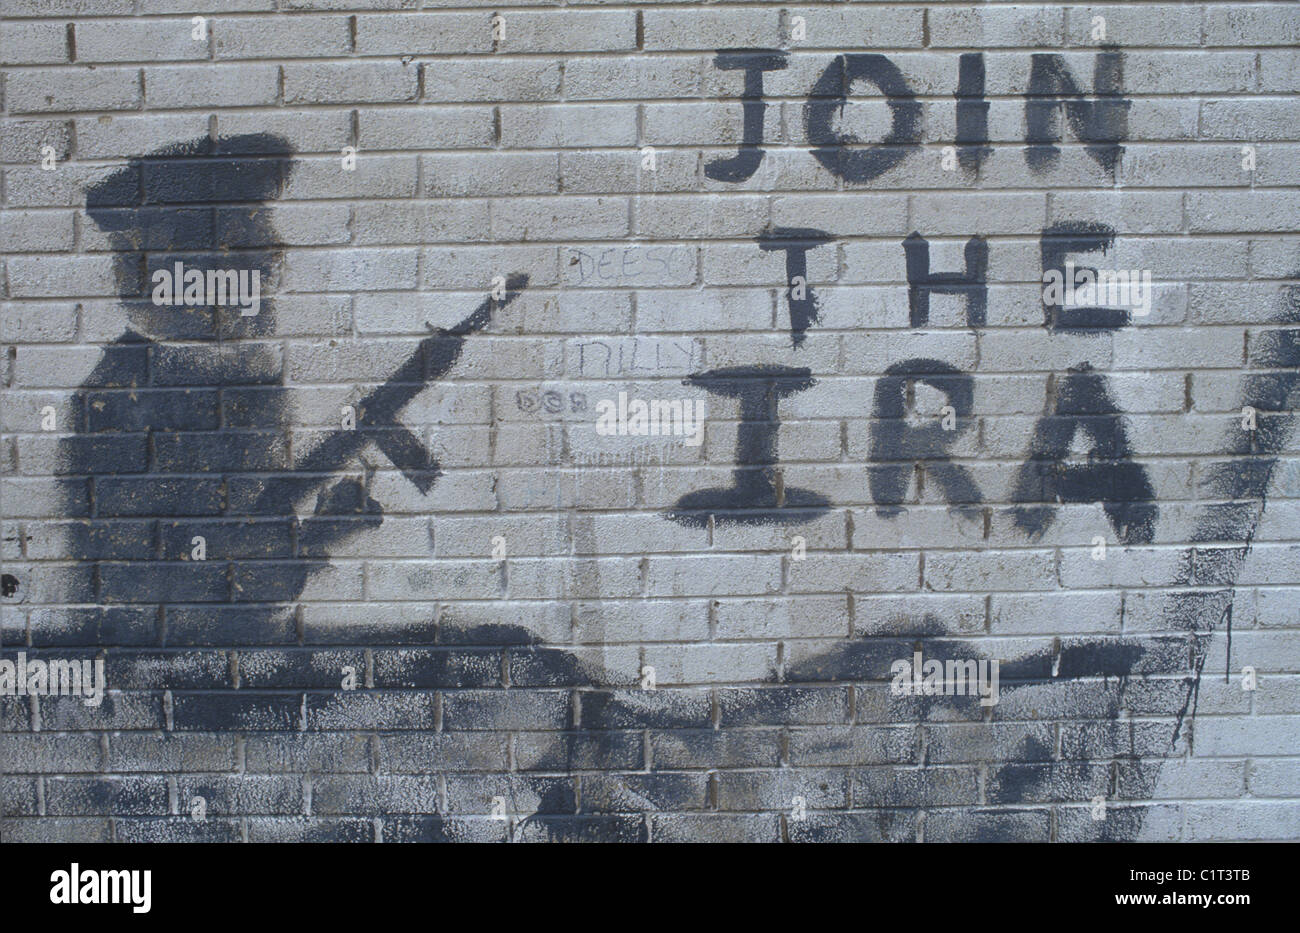 Belfast The Troubles. 1980s. IRA graffiti HOMER SYKES - Stock Image